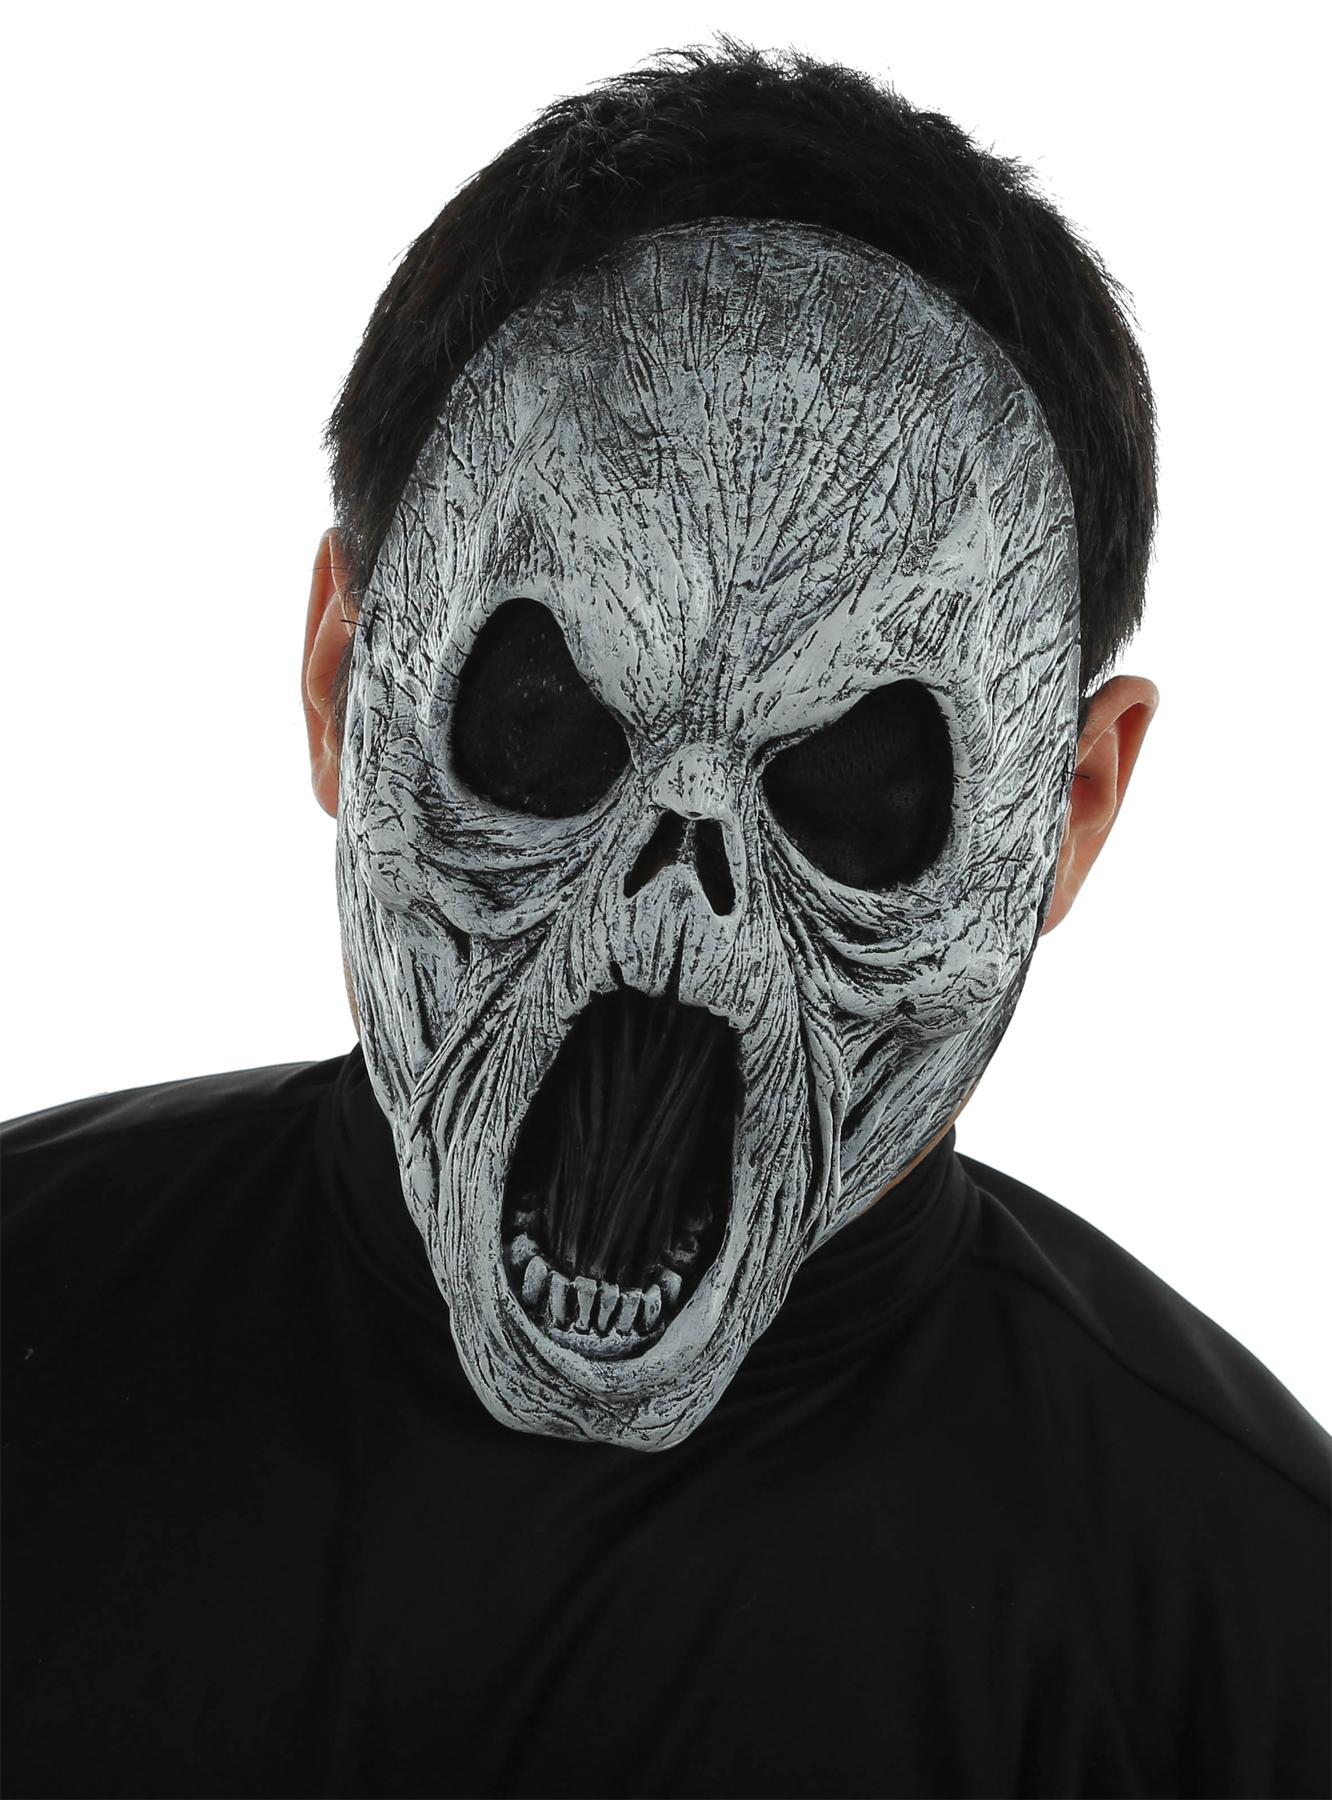 Wailing Spirit Mask